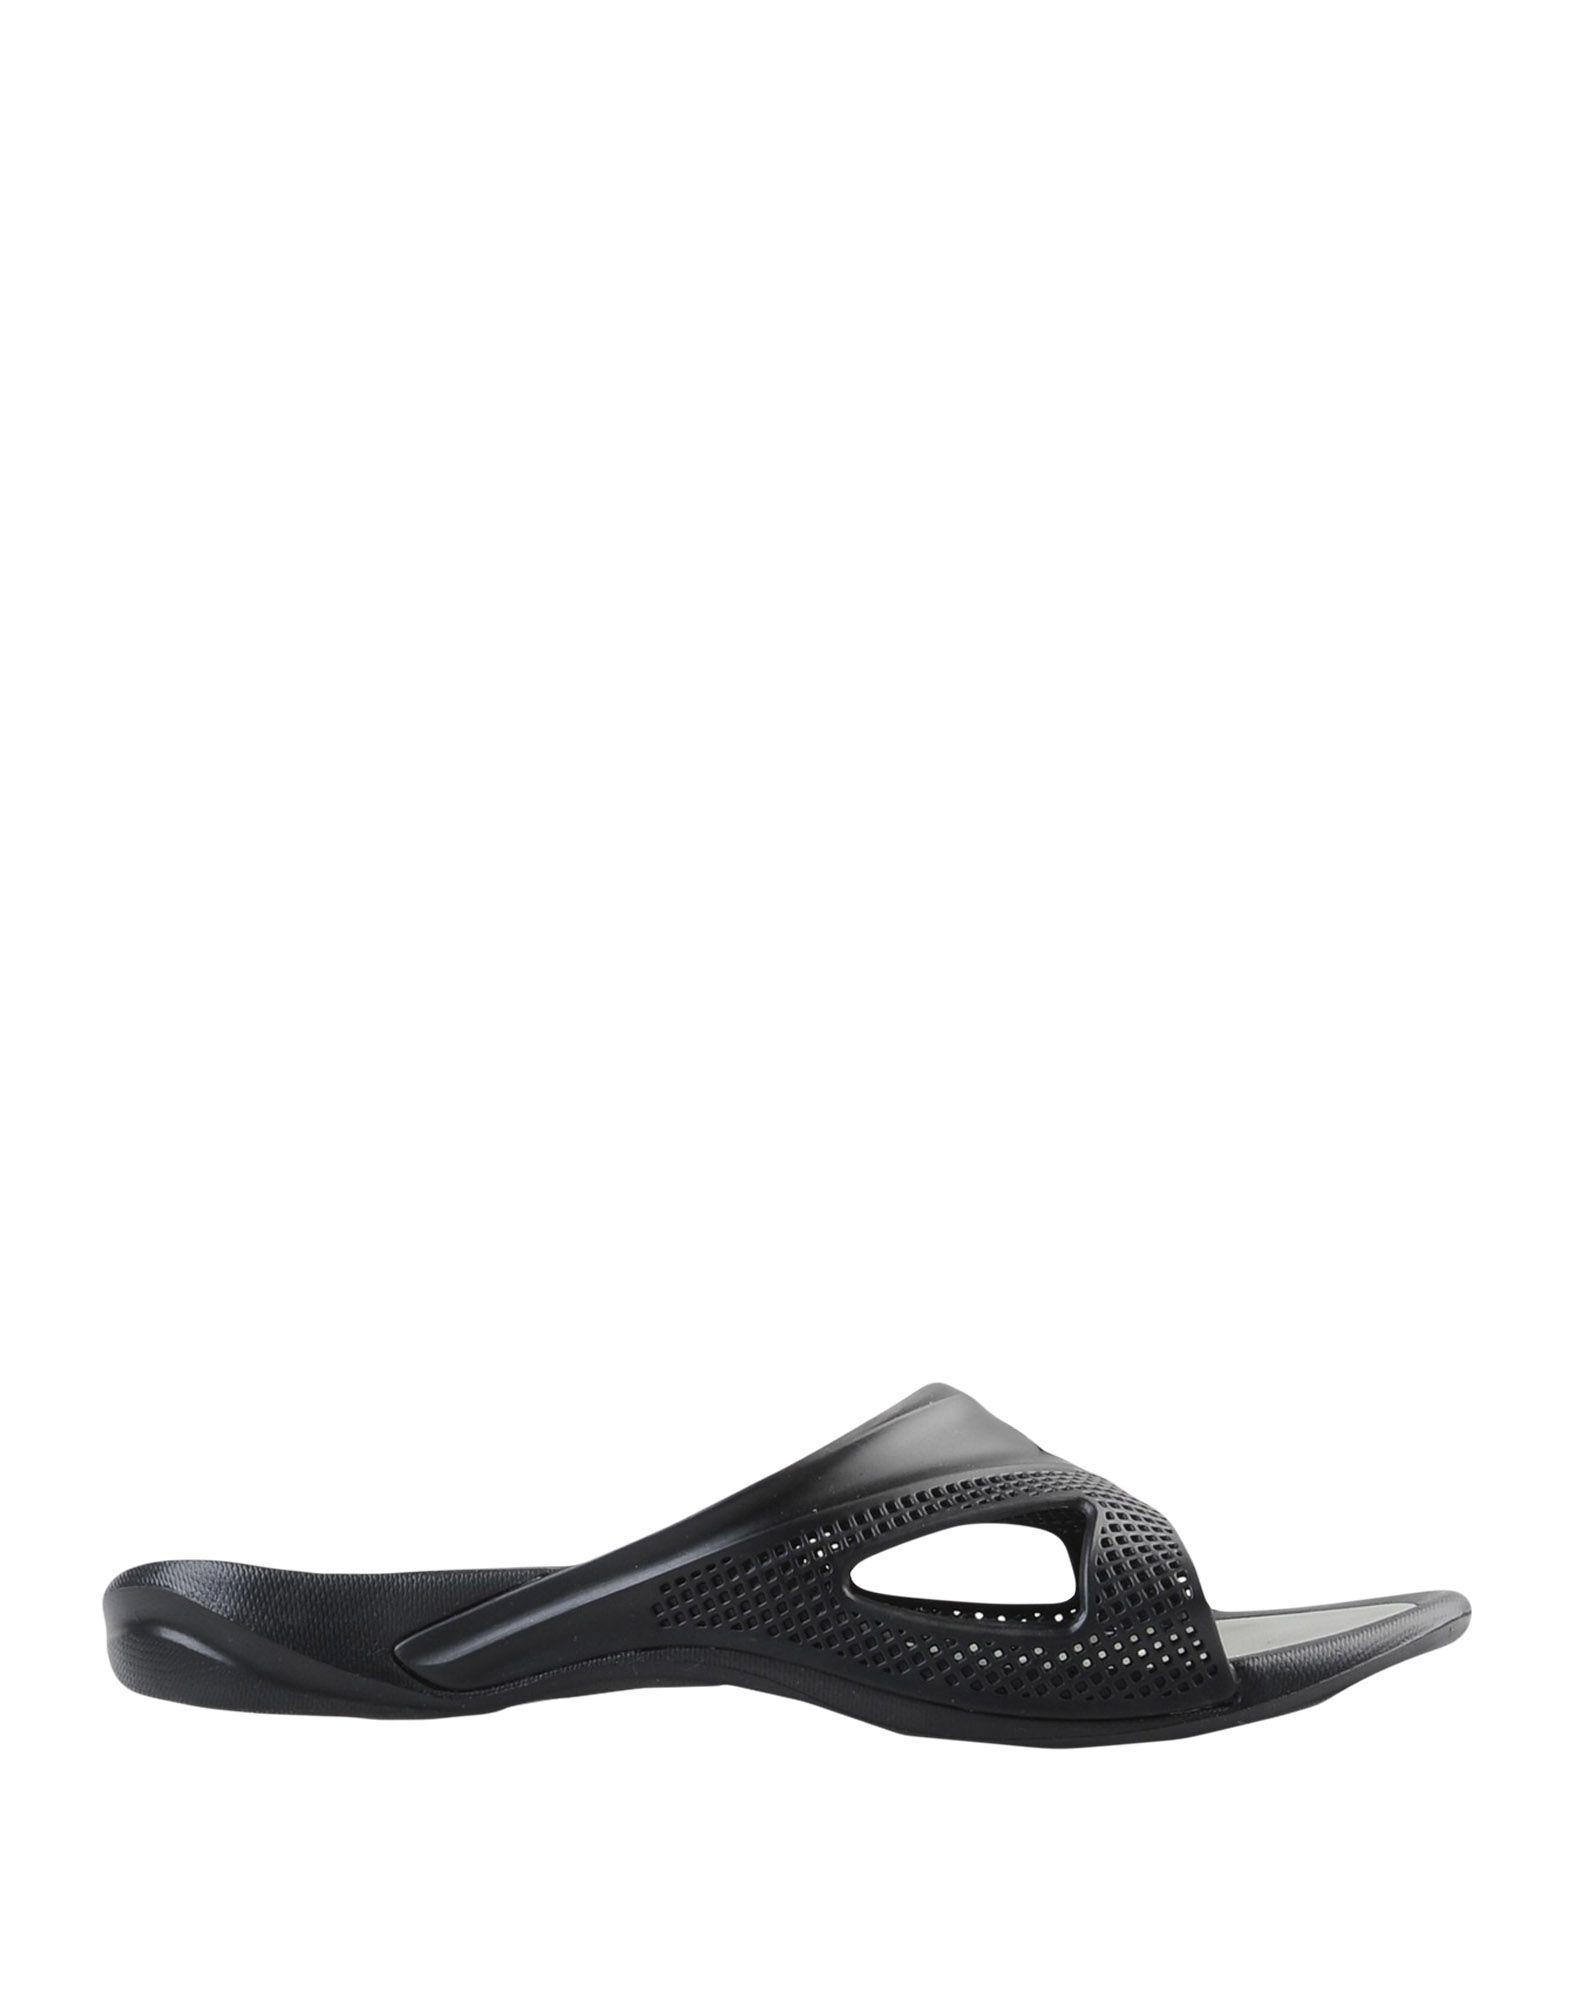 0213ca572aaf Lyst - Arena Sandals in Black for Men